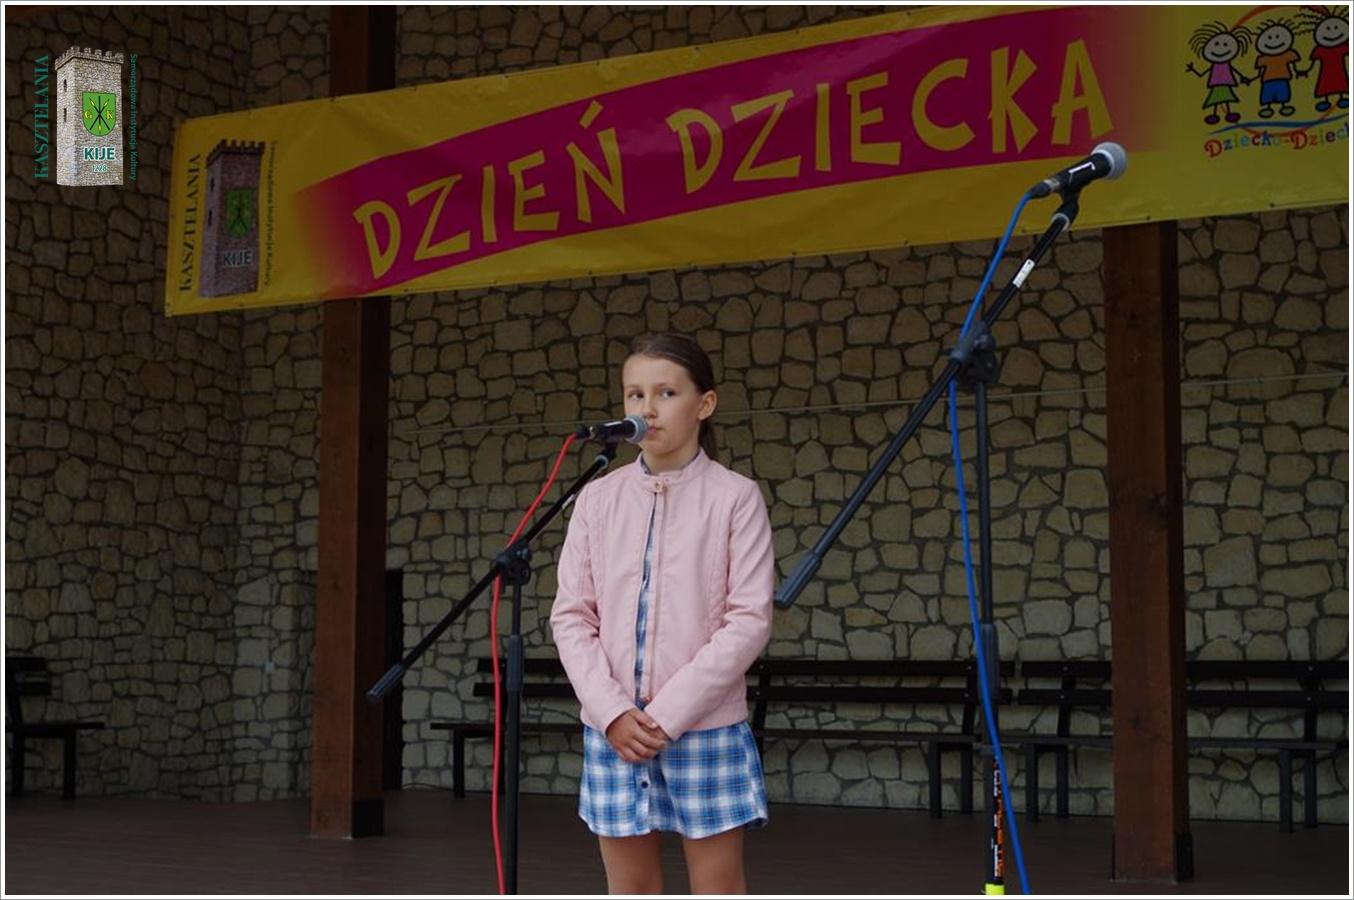 images/galleries/imprezy/2017/dzien_dziecka2017/IMGP0652 (Copy)